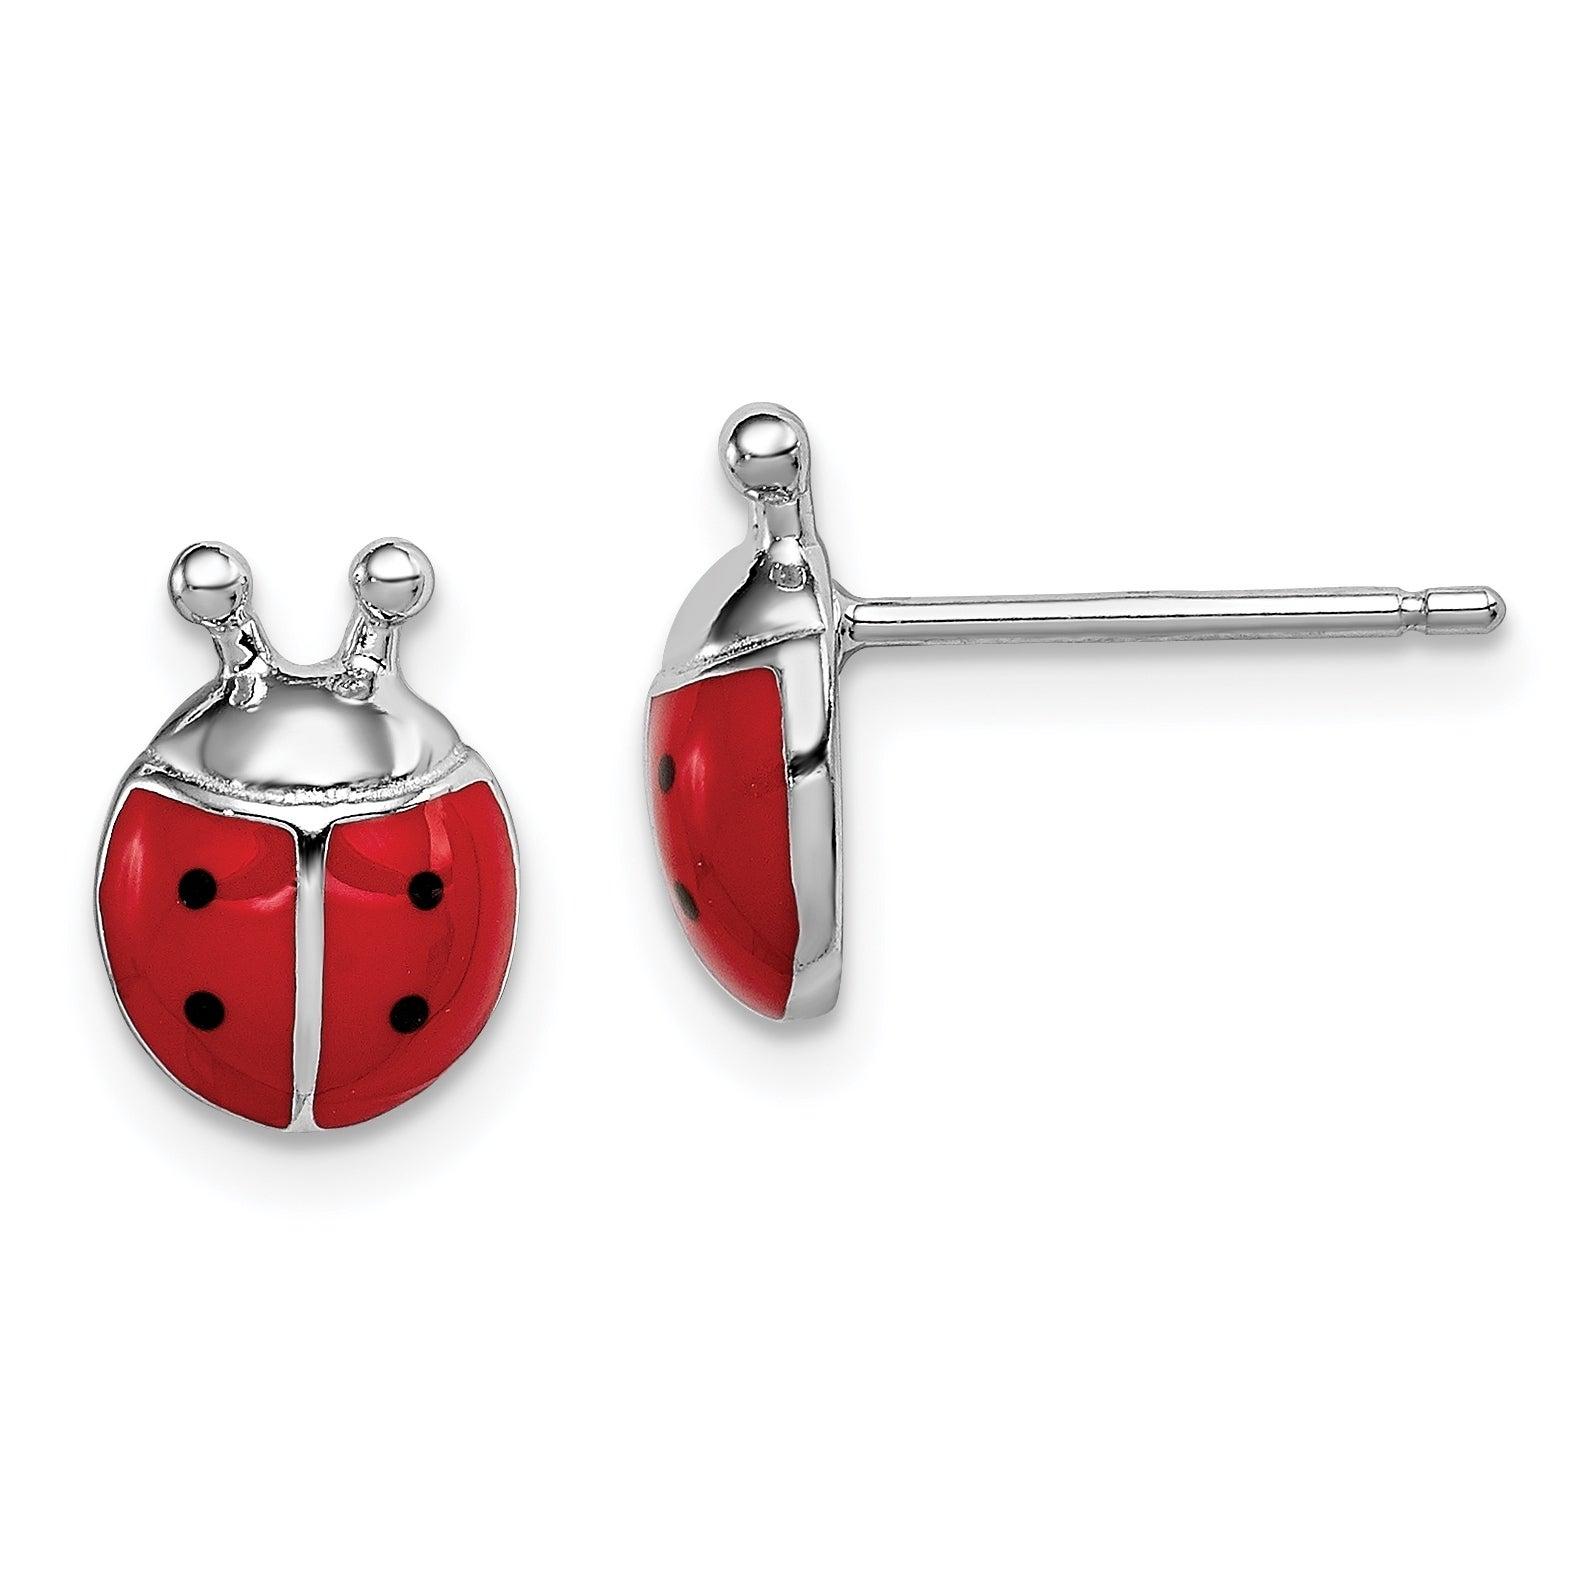 Sterling Silver Ladybug CZ Stud Earrings Lady Bug